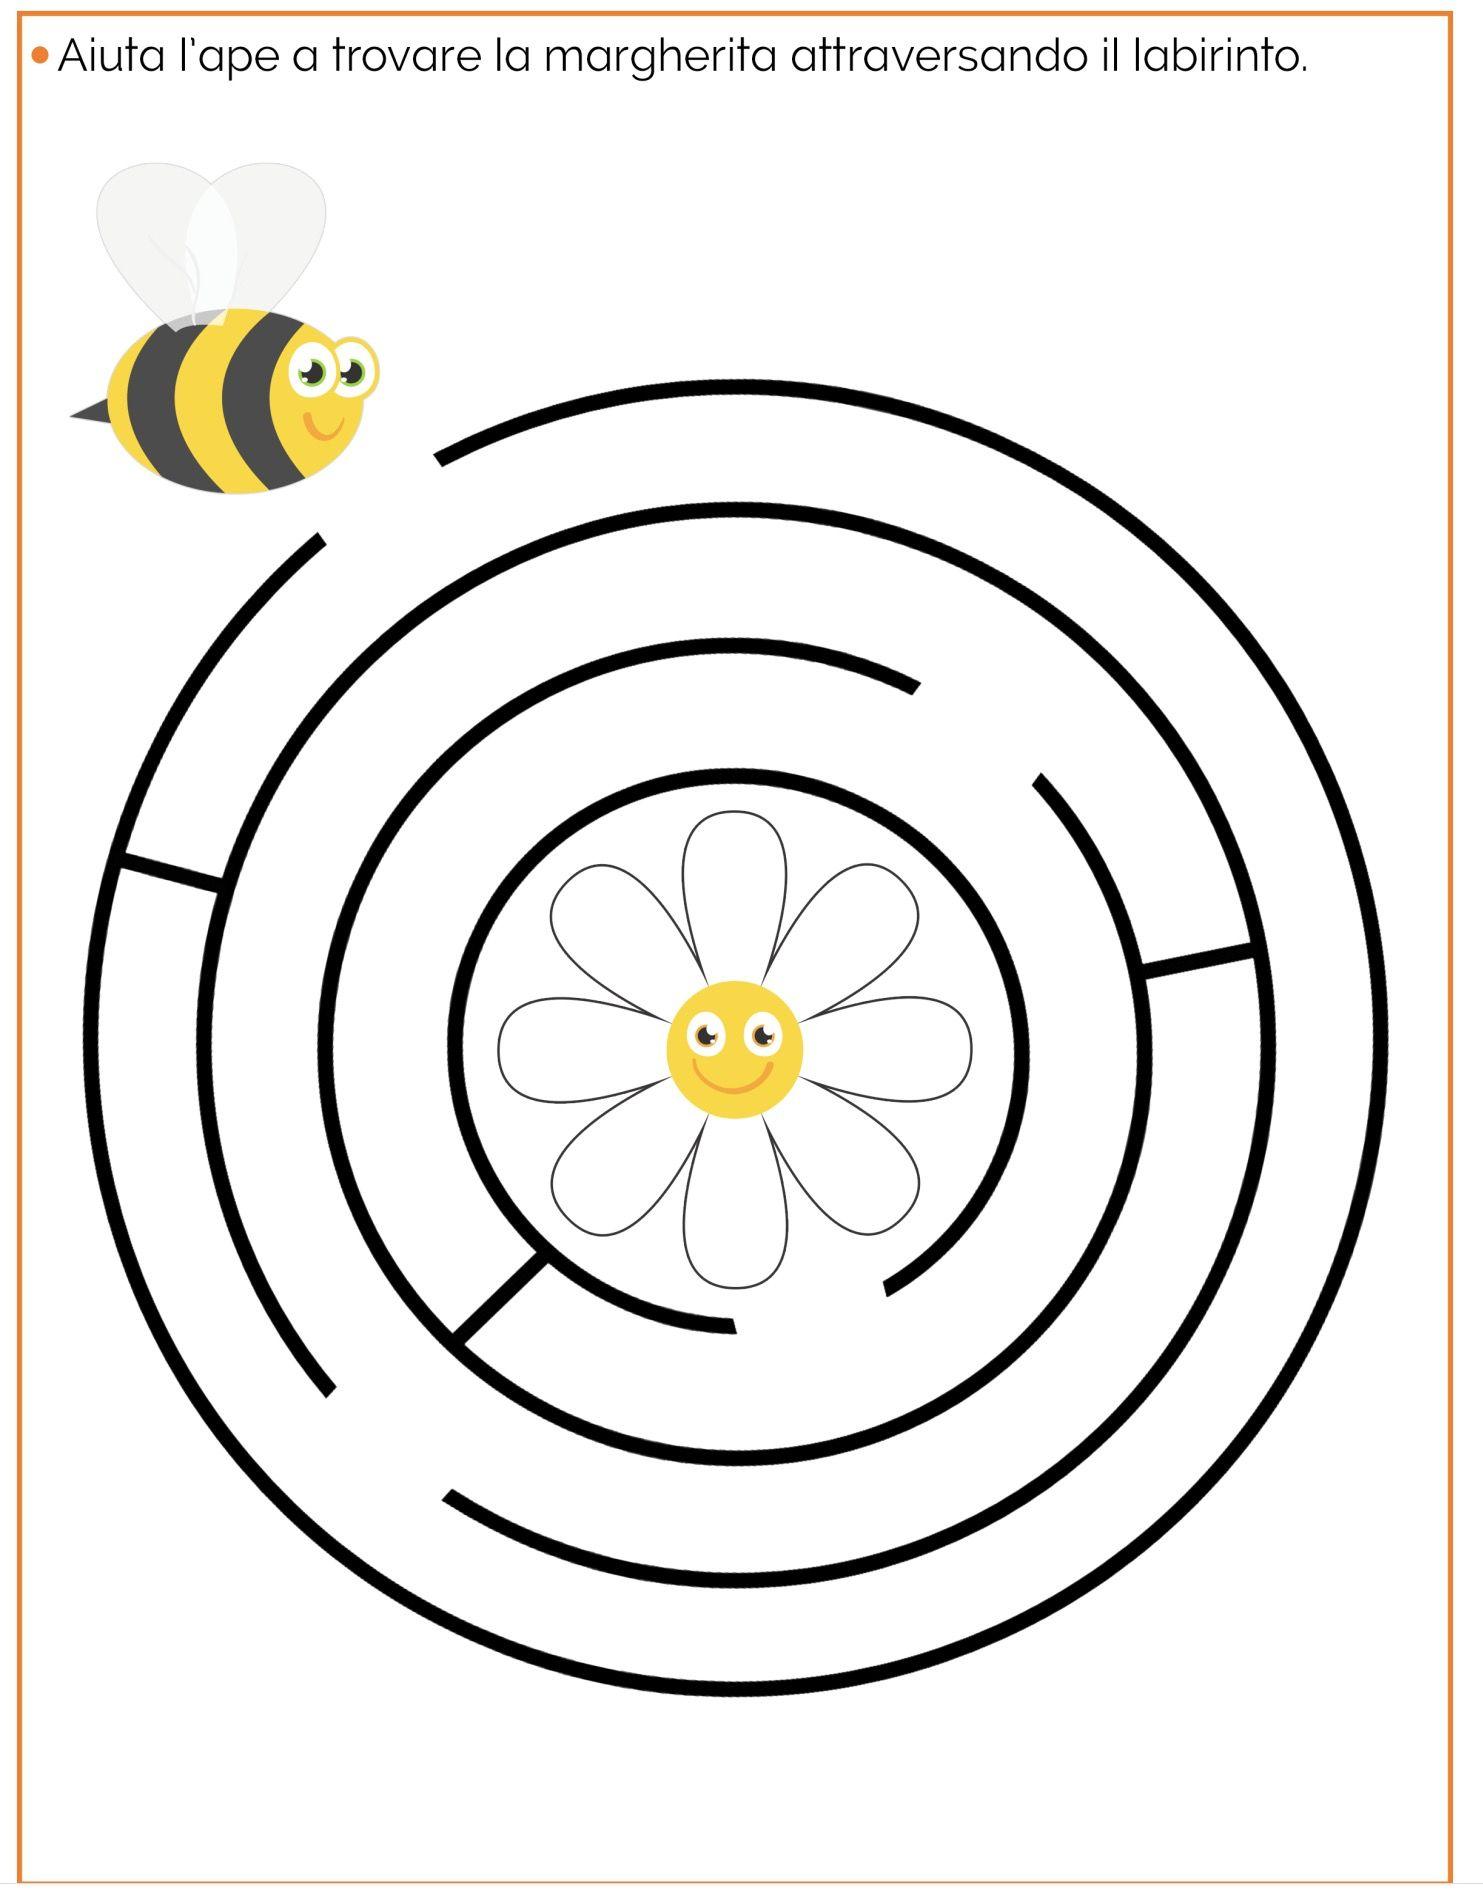 Pin de Małgorzata en Labirynty | Pinterest | Laberintos y Preescolar